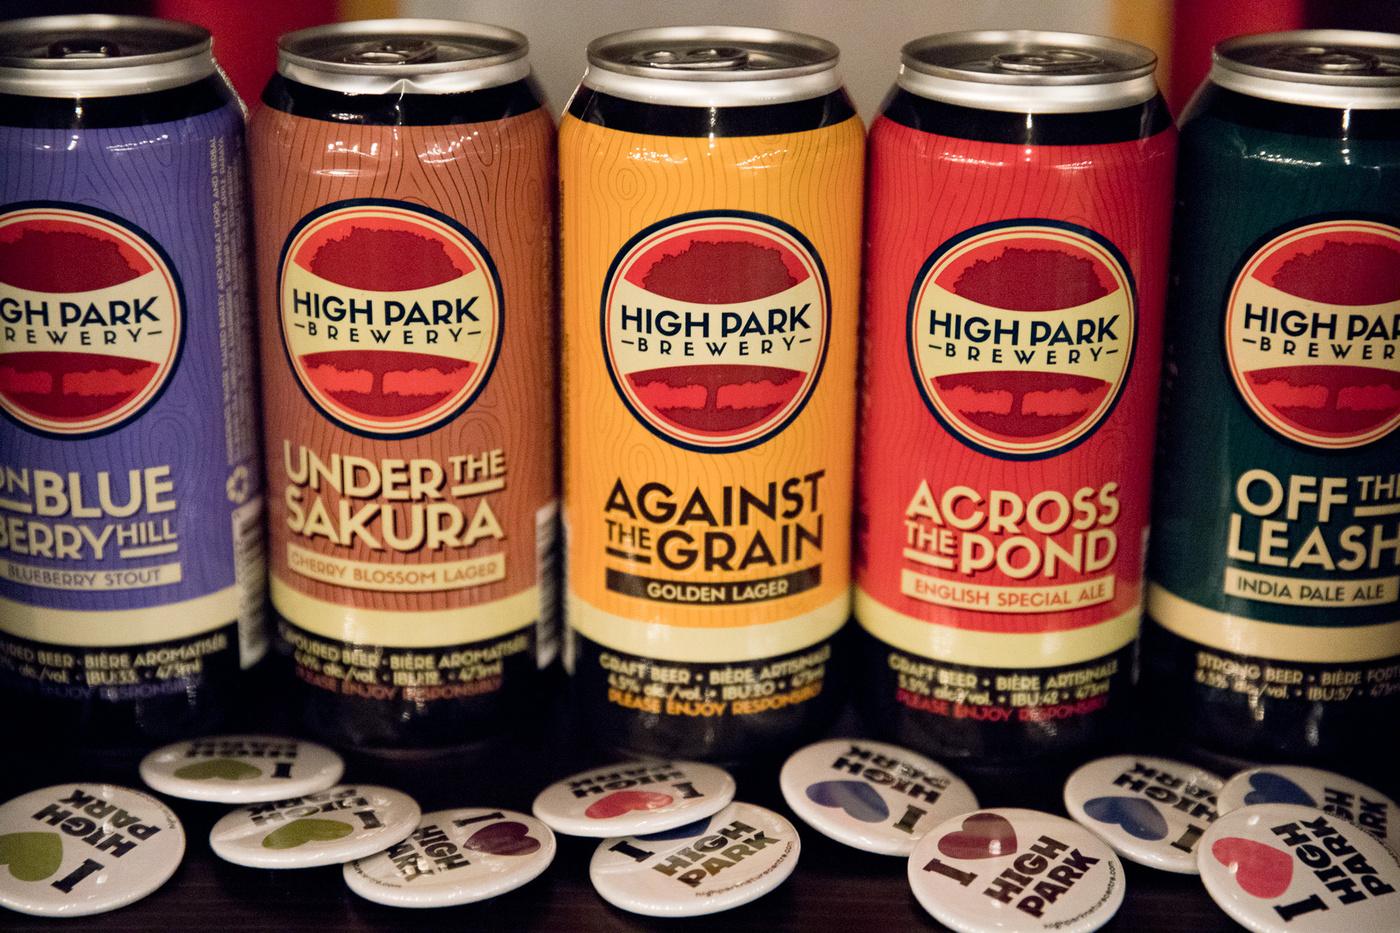 High Park Brewery Toronto